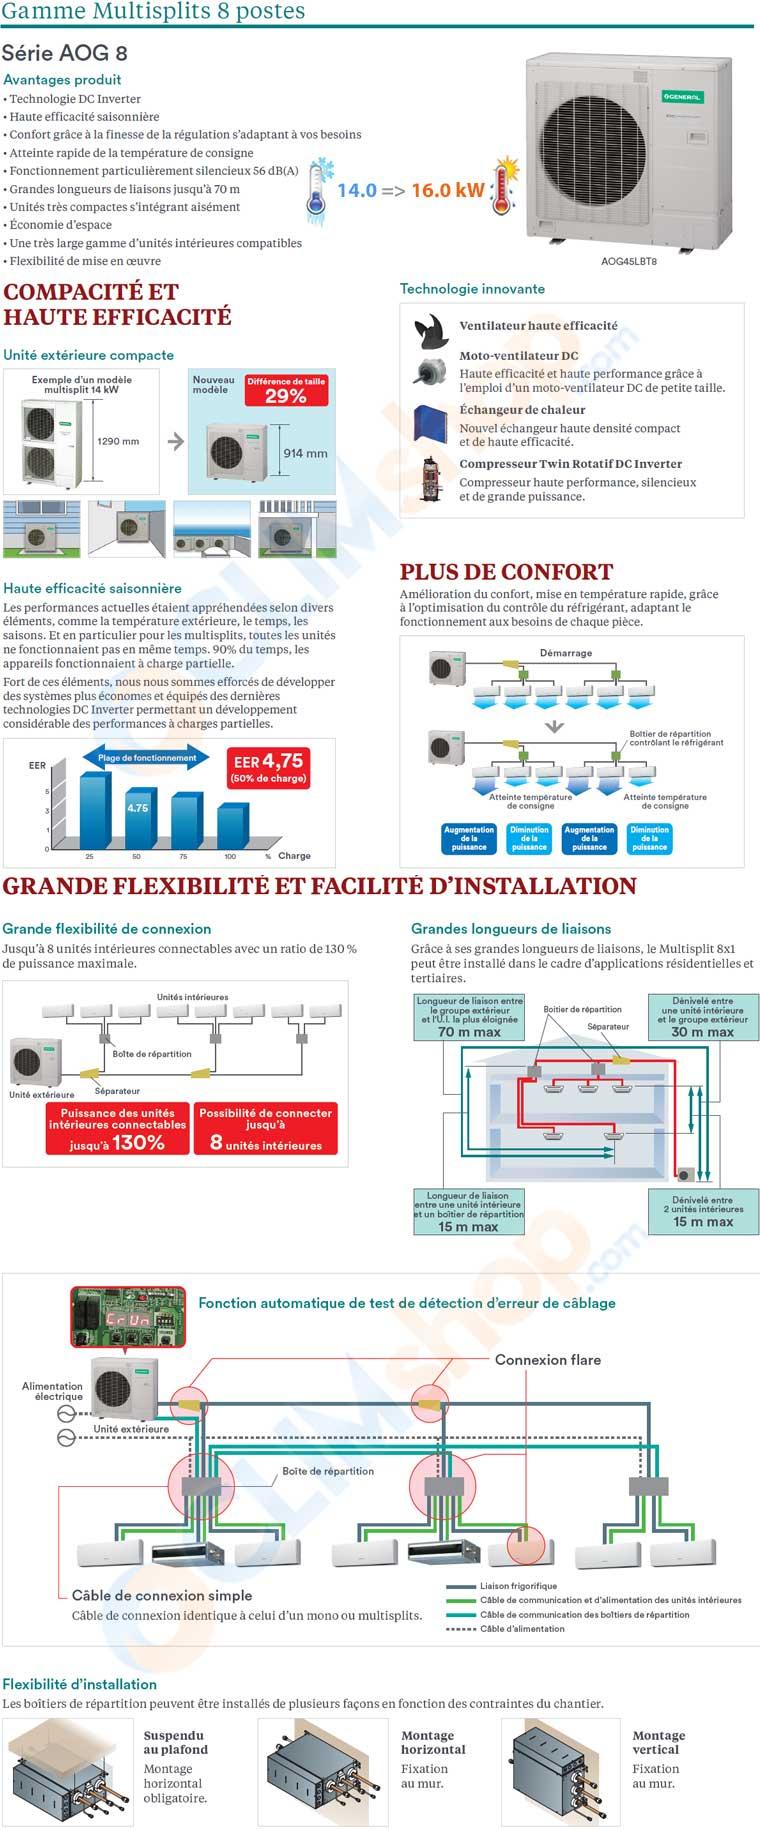 Présentation du multisplit 8 postes AOG8 de Fujitsu General